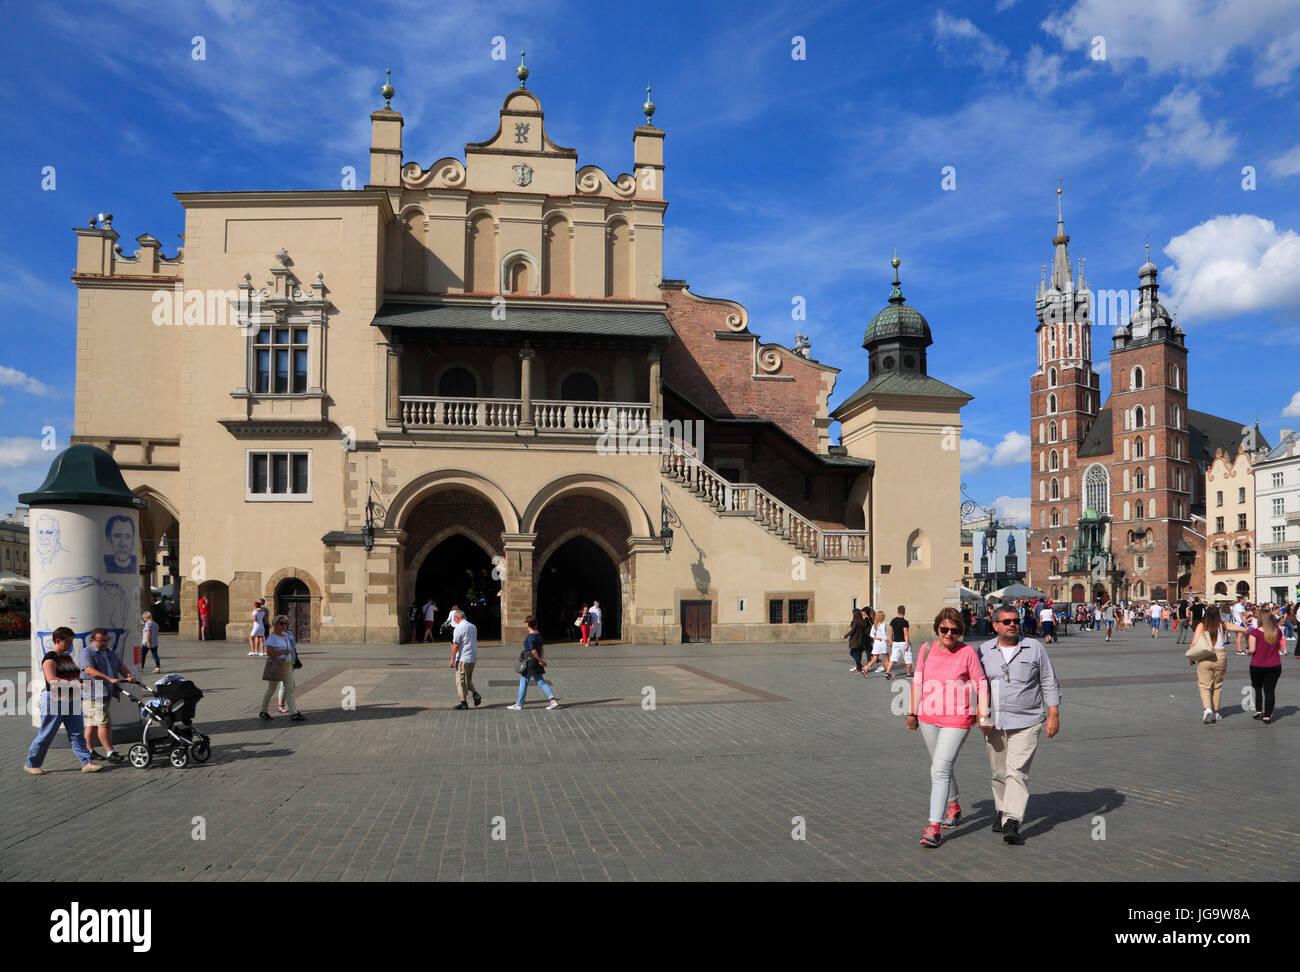 Cloth Halls at Rynek, Krakow, Poland, Europe - Stock Image